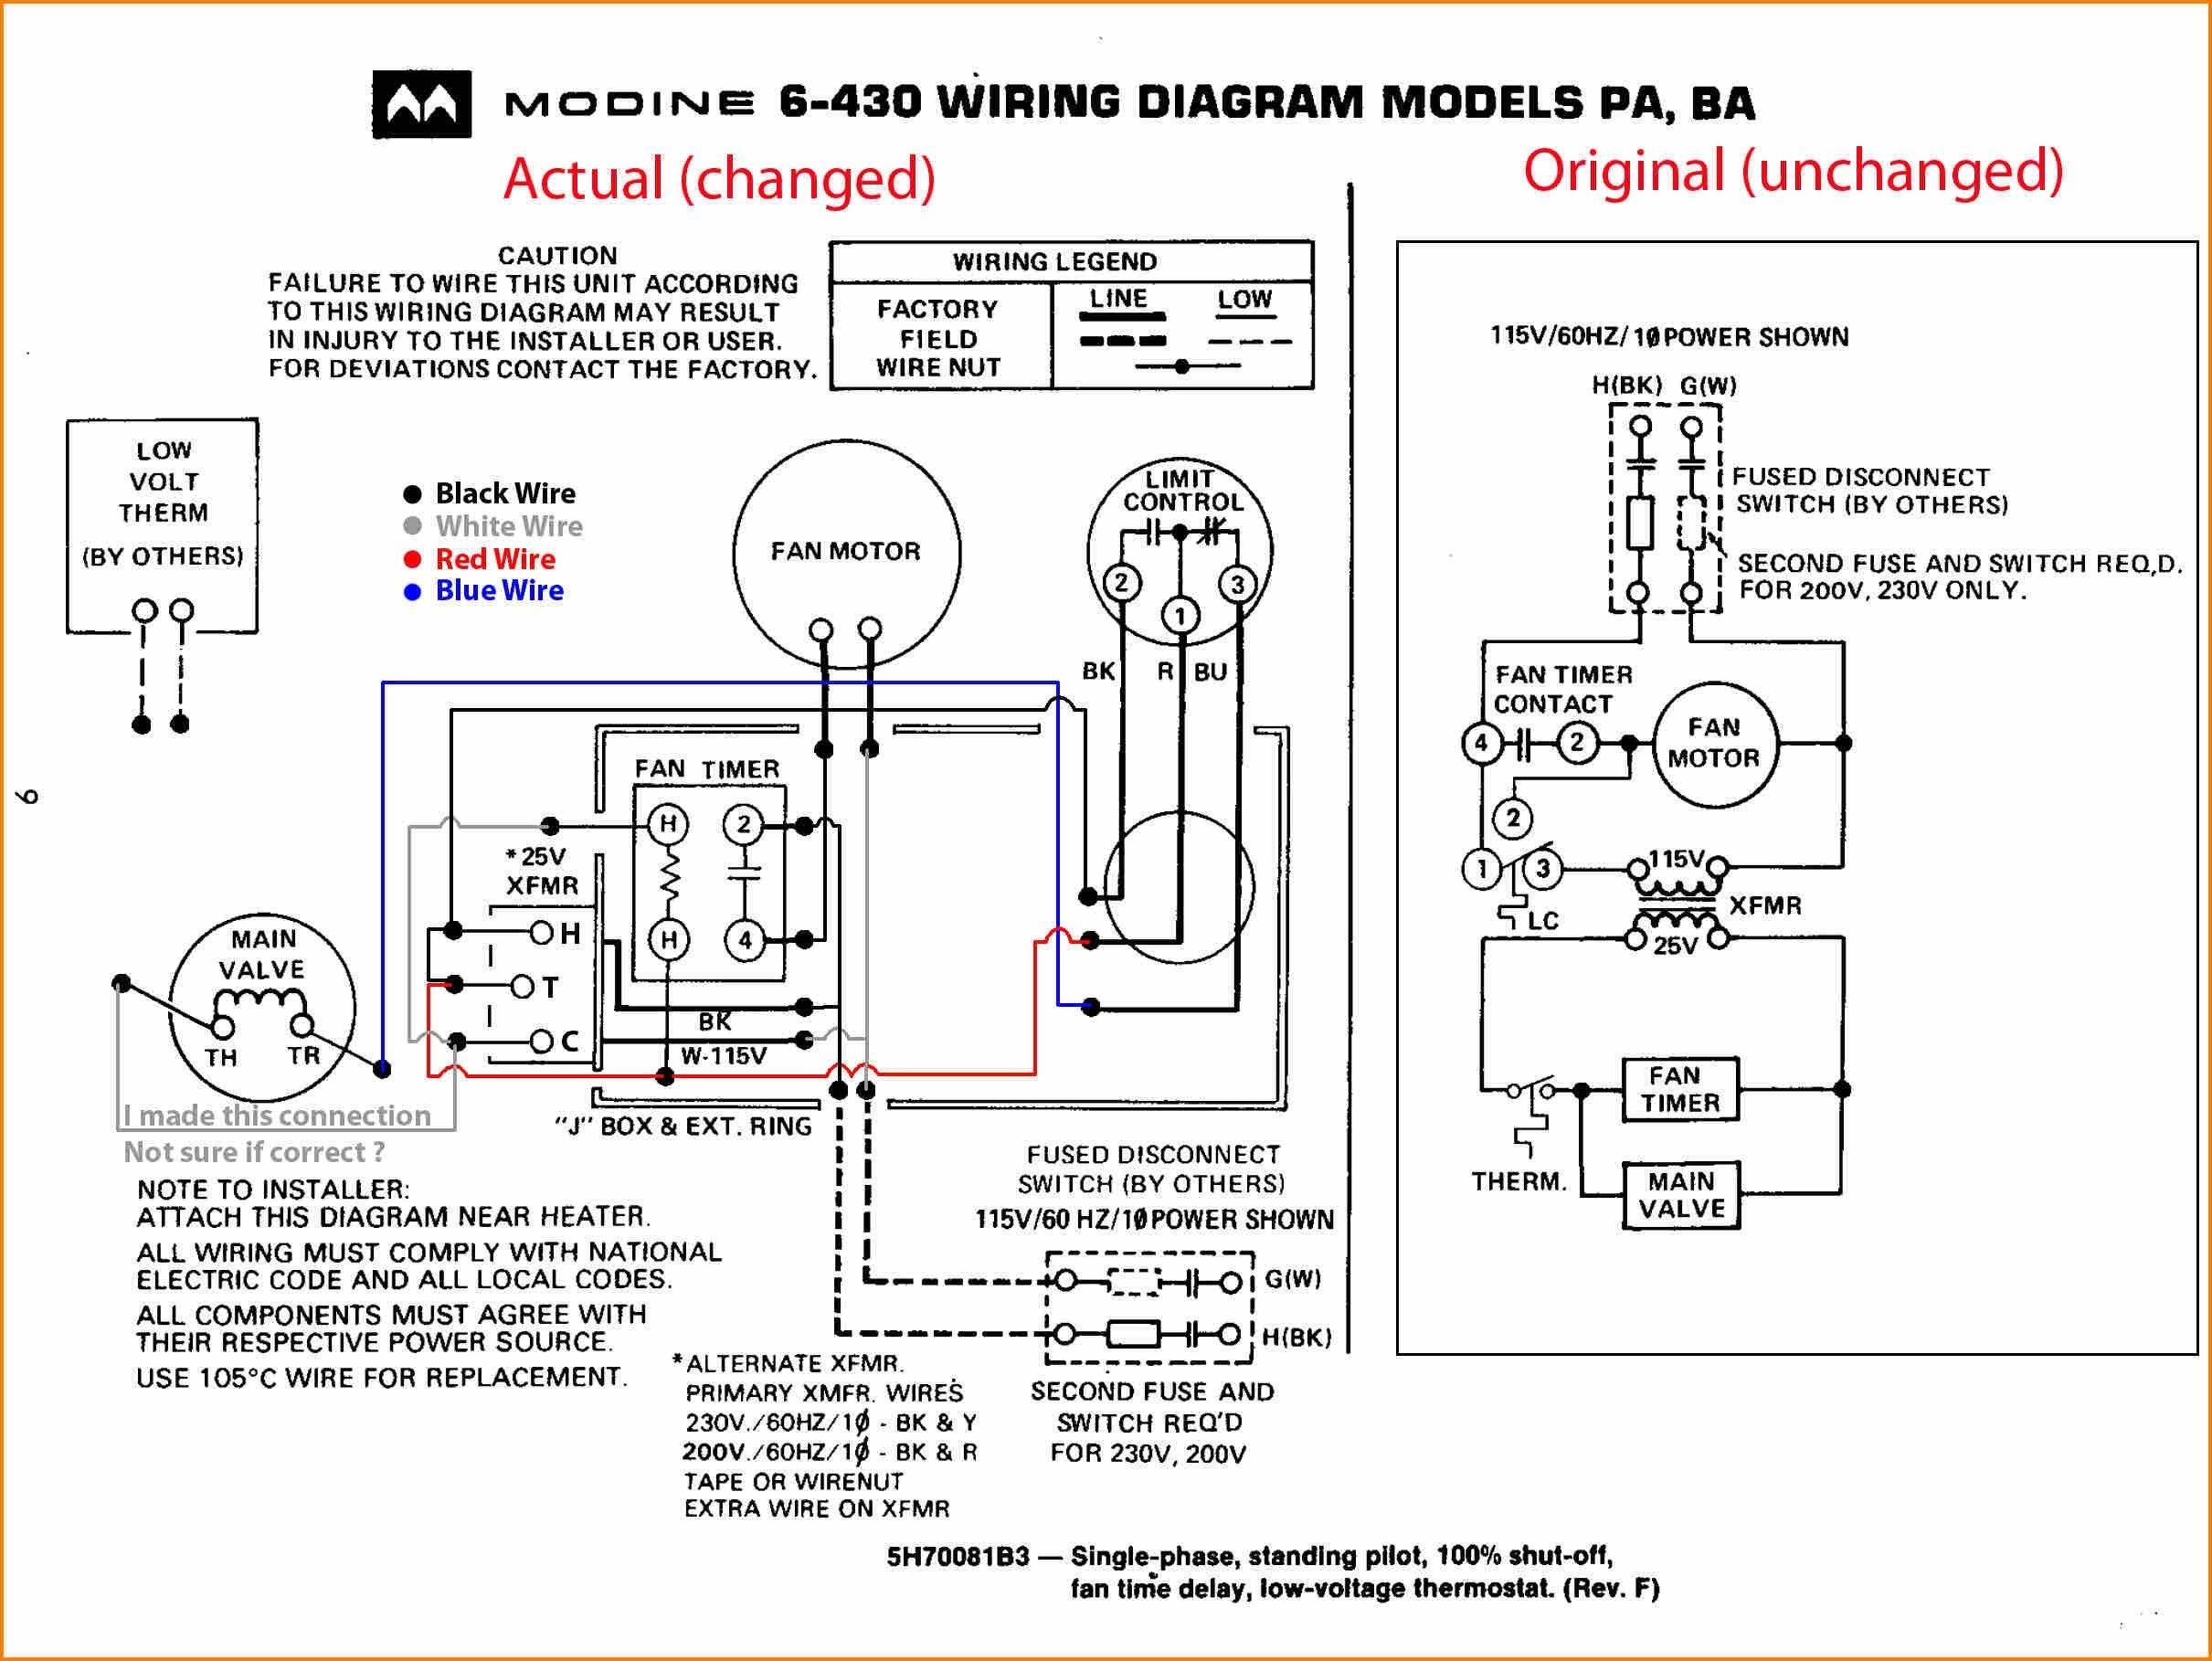 12 Complex Electric Motor Wiring Diagram Ideas Https Bacamajalah Com 12 Complex Electric Motor Electrical Wiring Diagram Thermostat Wiring Electric Furnace